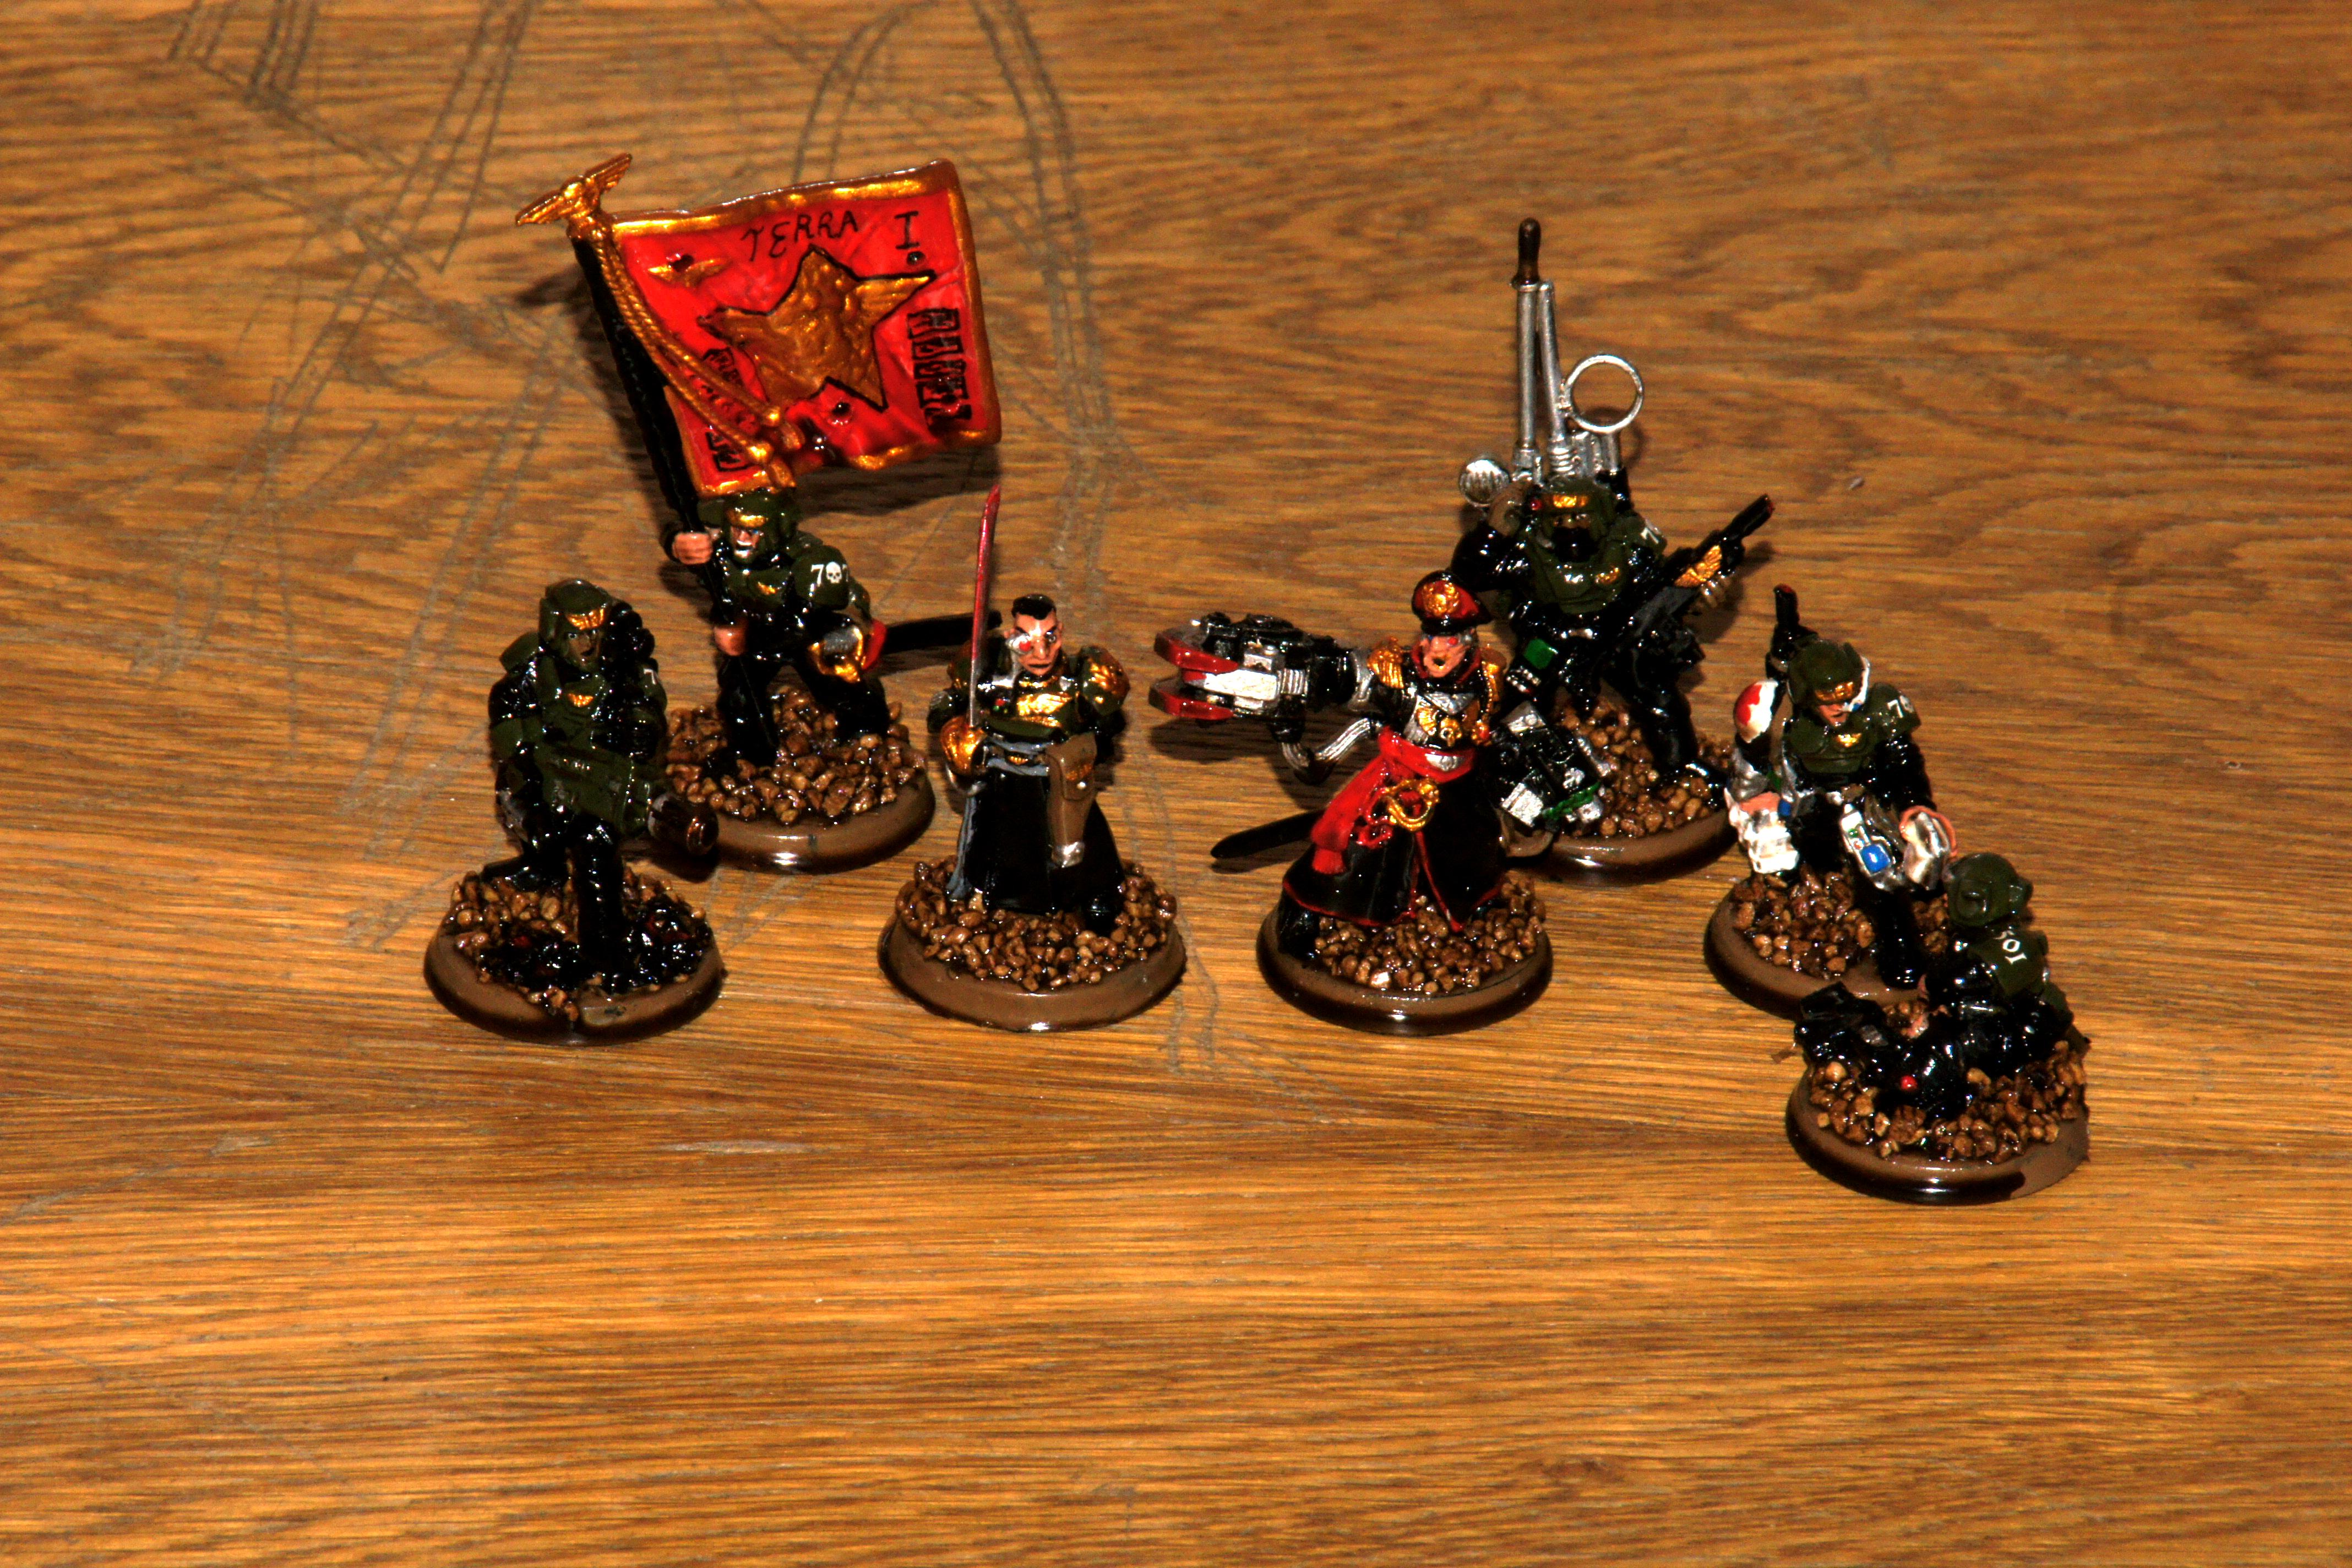 Army Painter, Astra Militarum, Command Hq, Imperial Guard, Quickshade